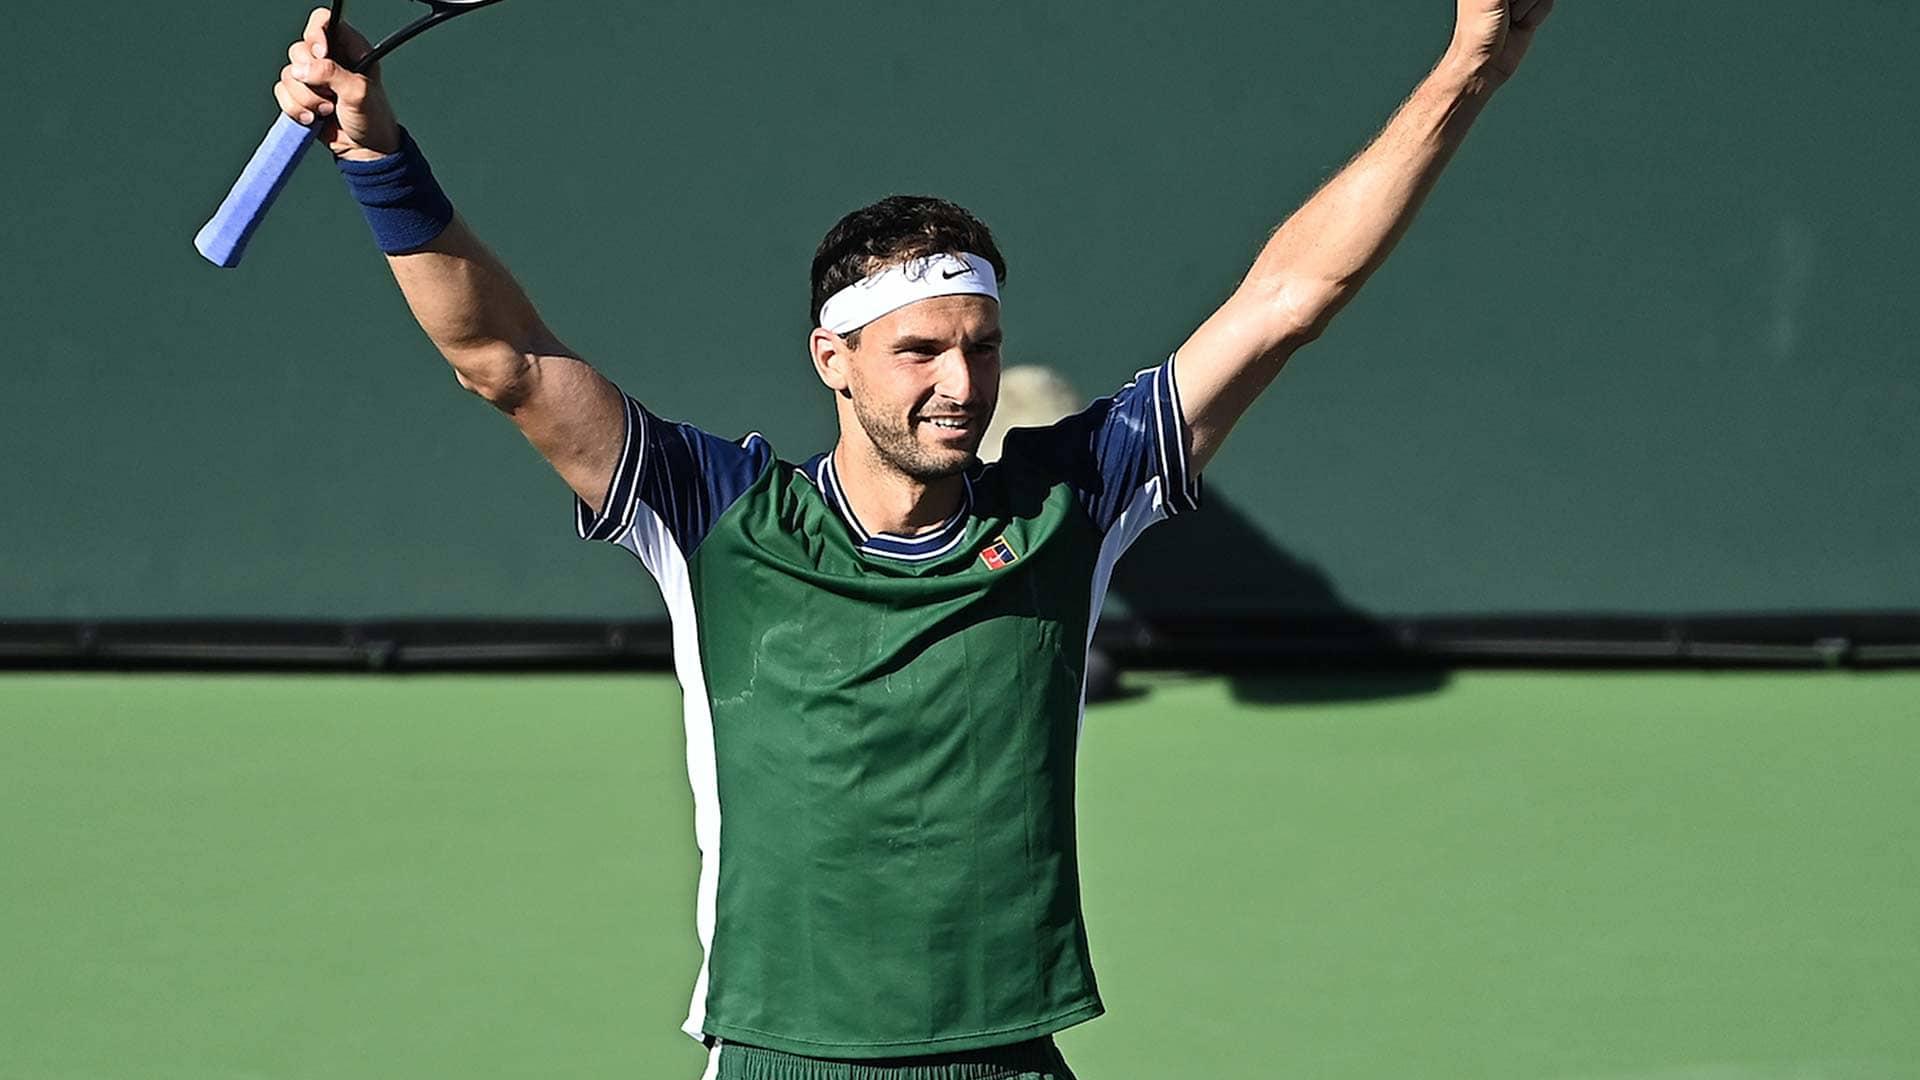 dimitrov indian wells 2021 wednesday 2 - ATP Indian Wells: Dimitrov našel svoj najboljši tenis